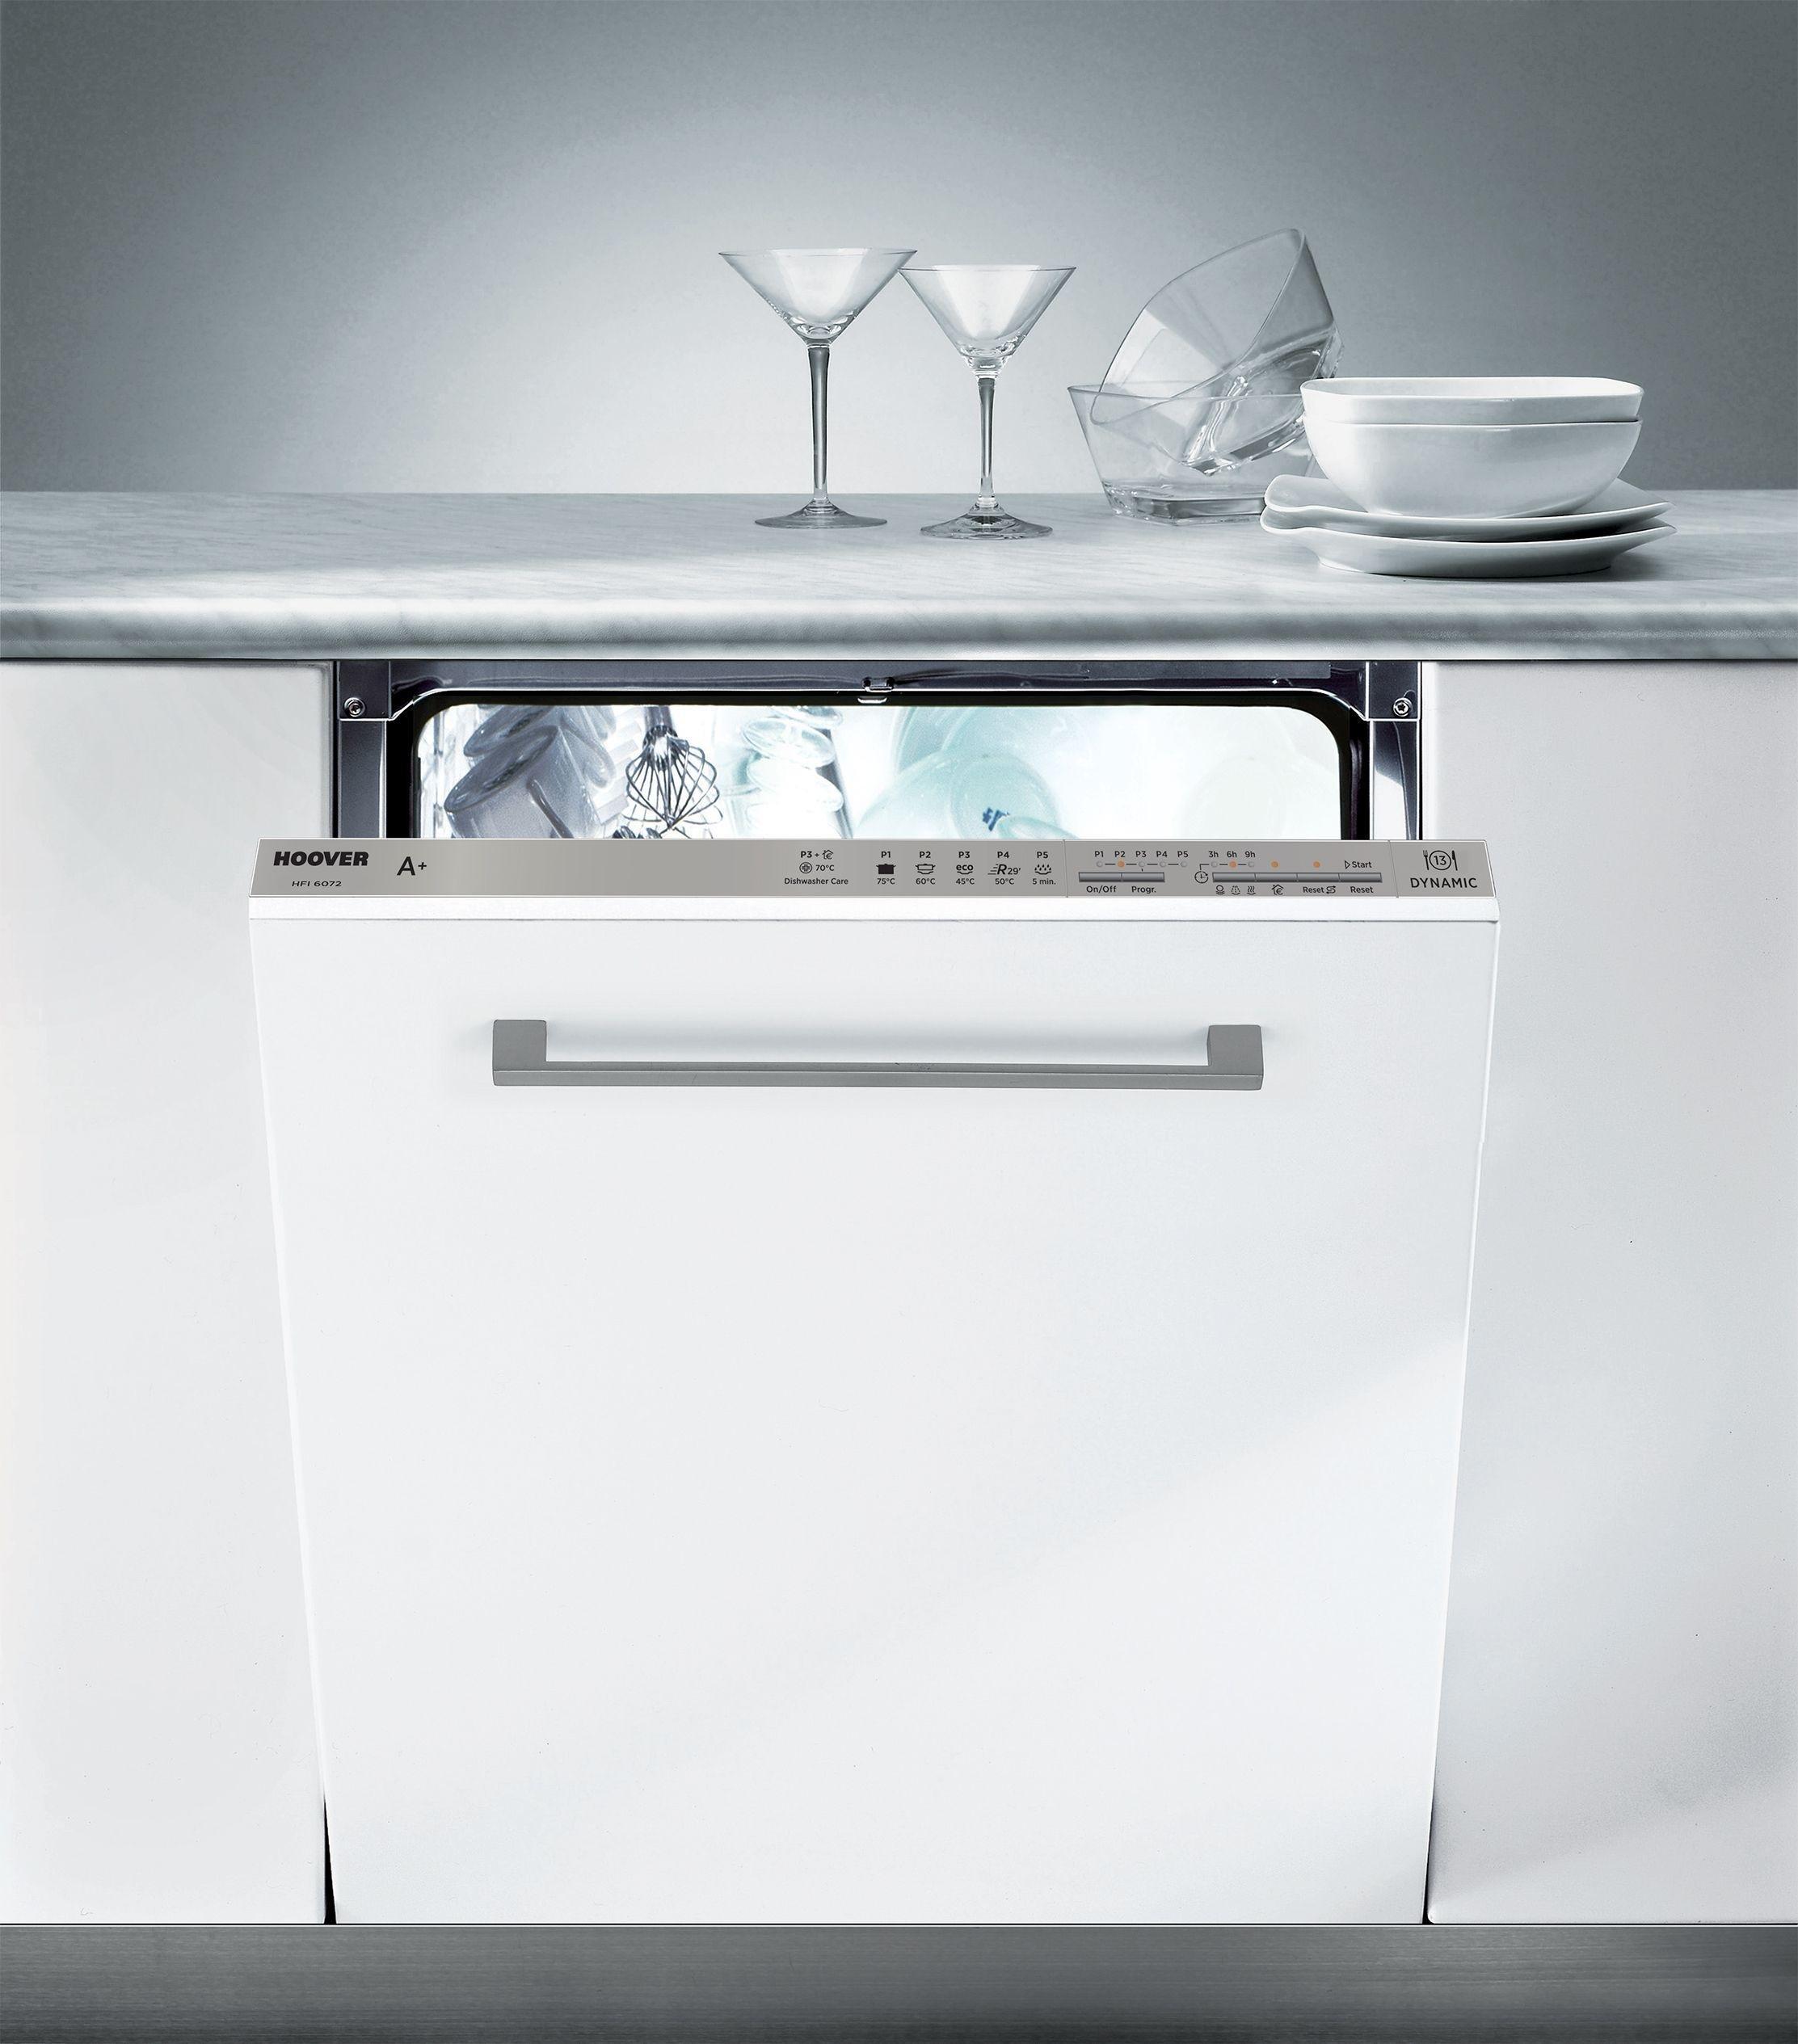 Hoover - HFI6072 Integrated Dishwasher - White